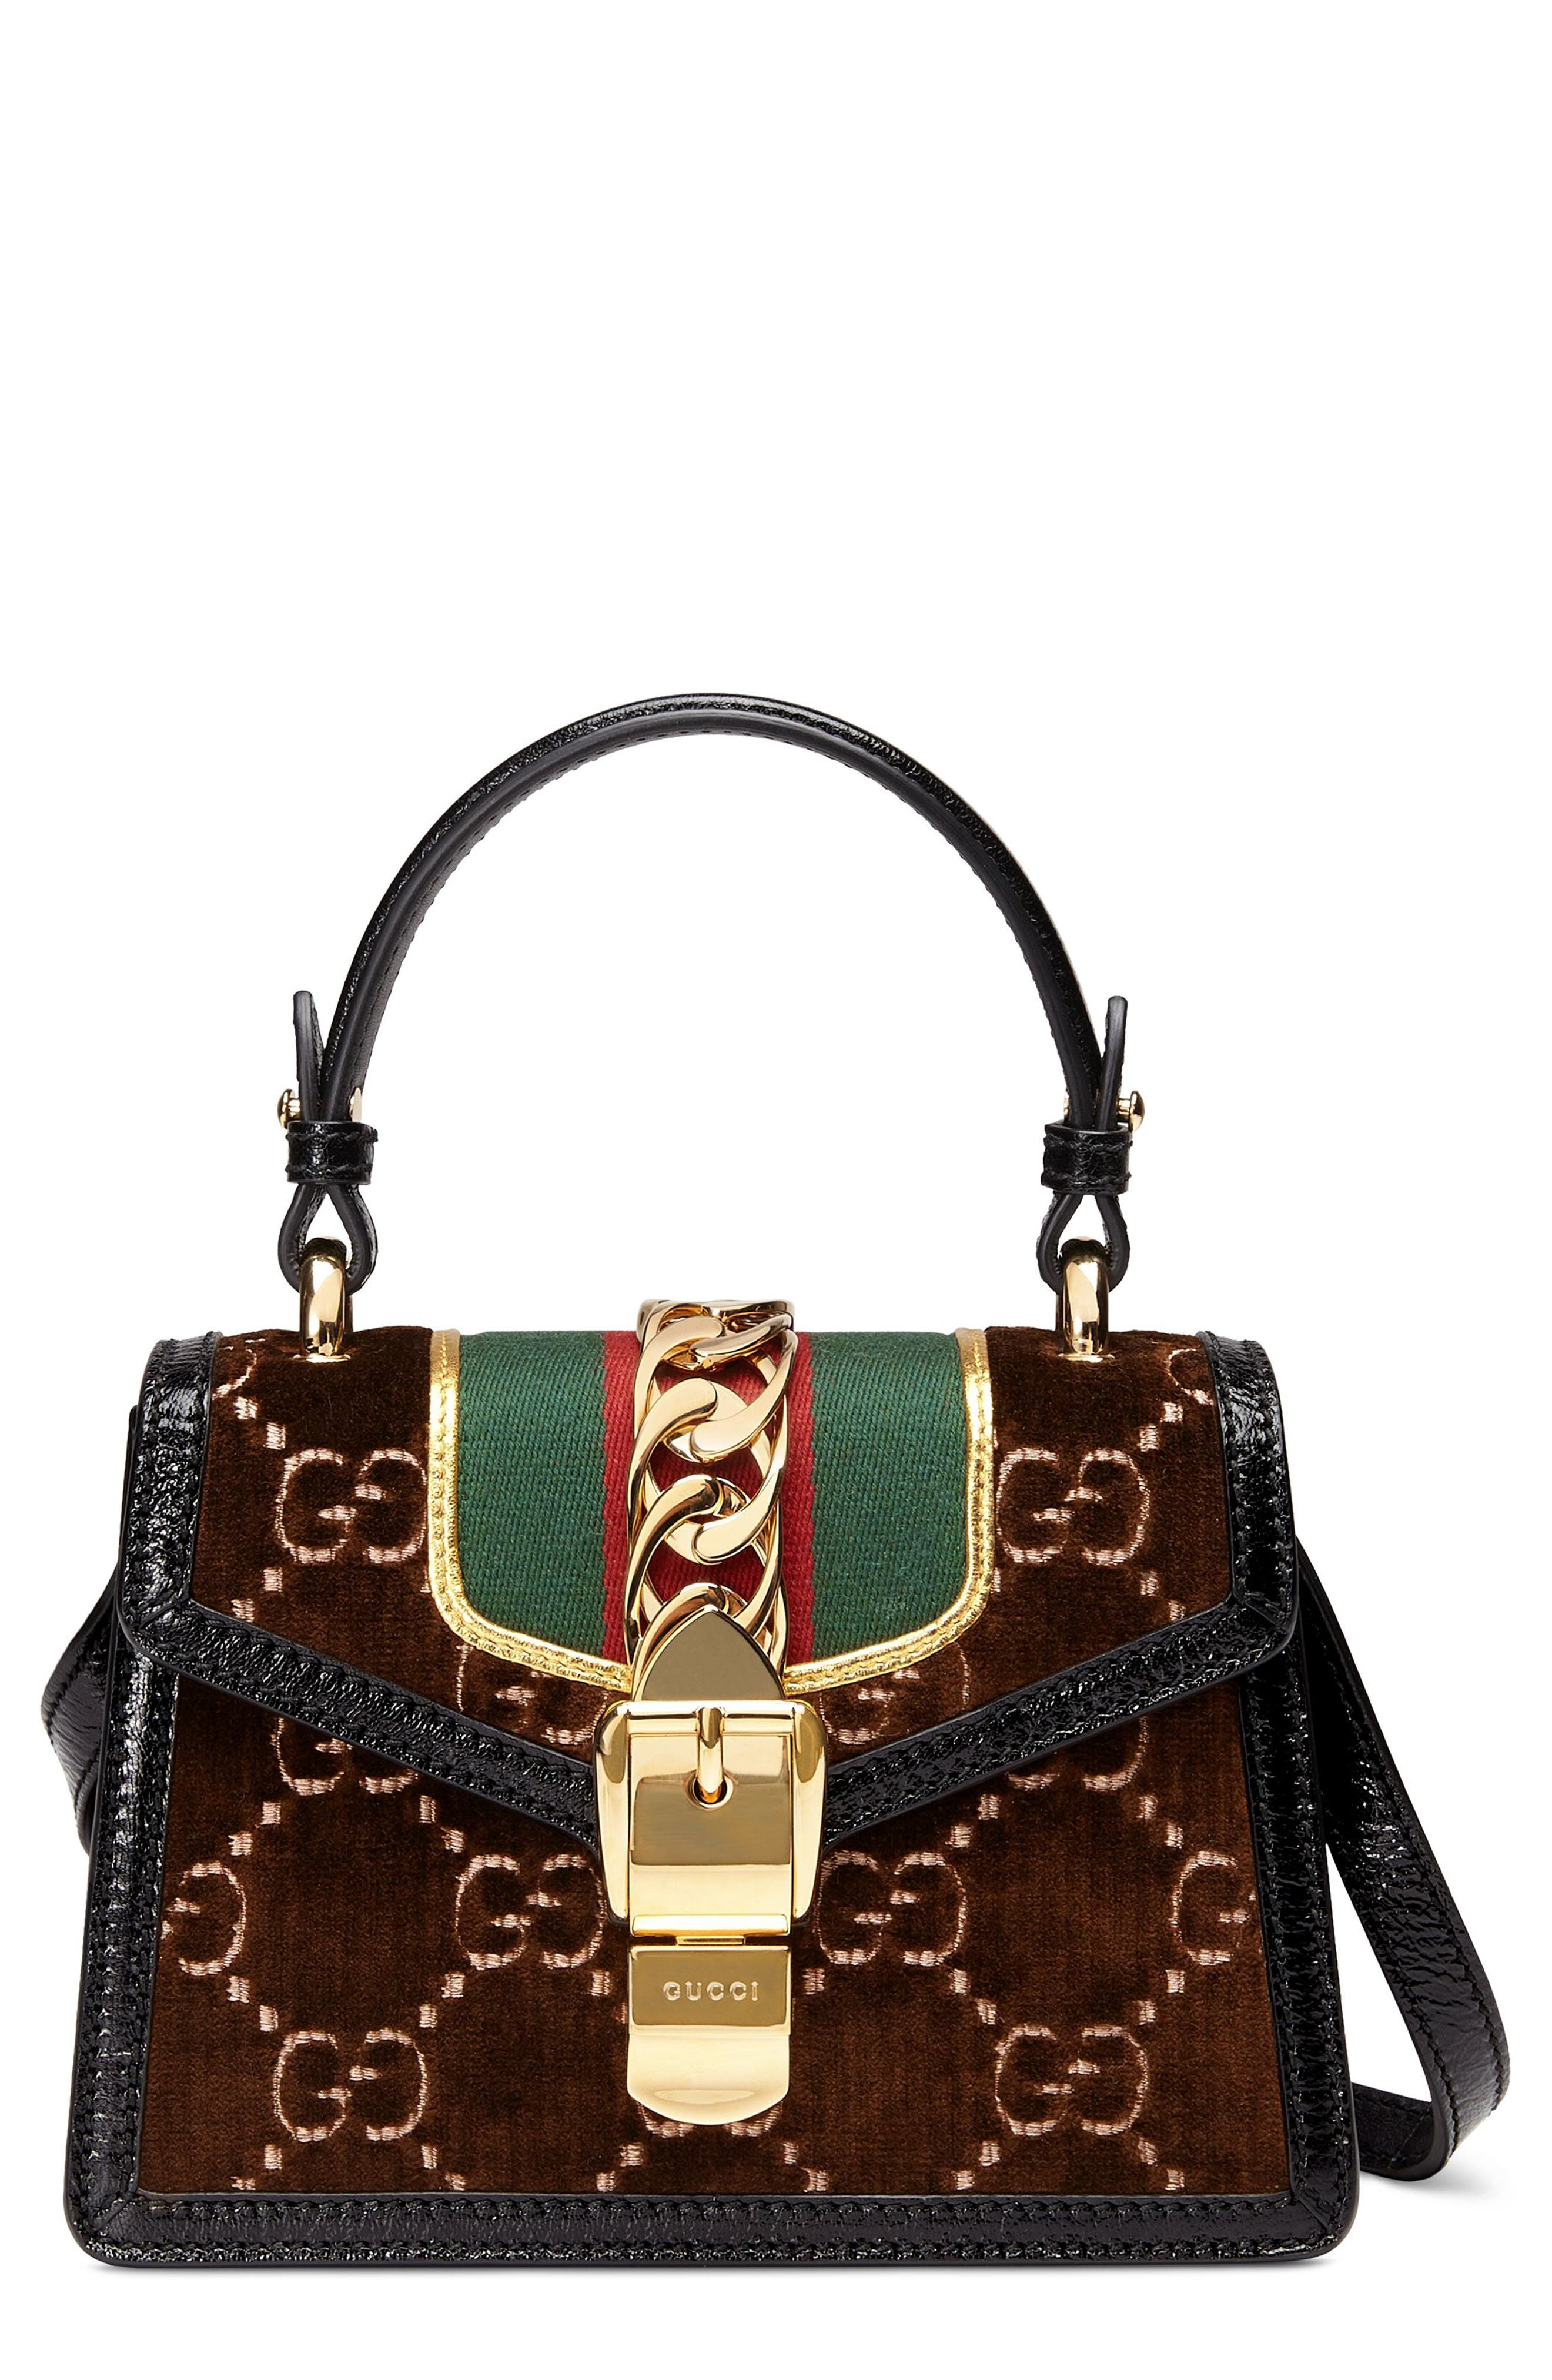 Mini Sylvie Velvet Top Handle Bag,                         Main,                         color, BROWN/ NERO/ VERT RED VERT